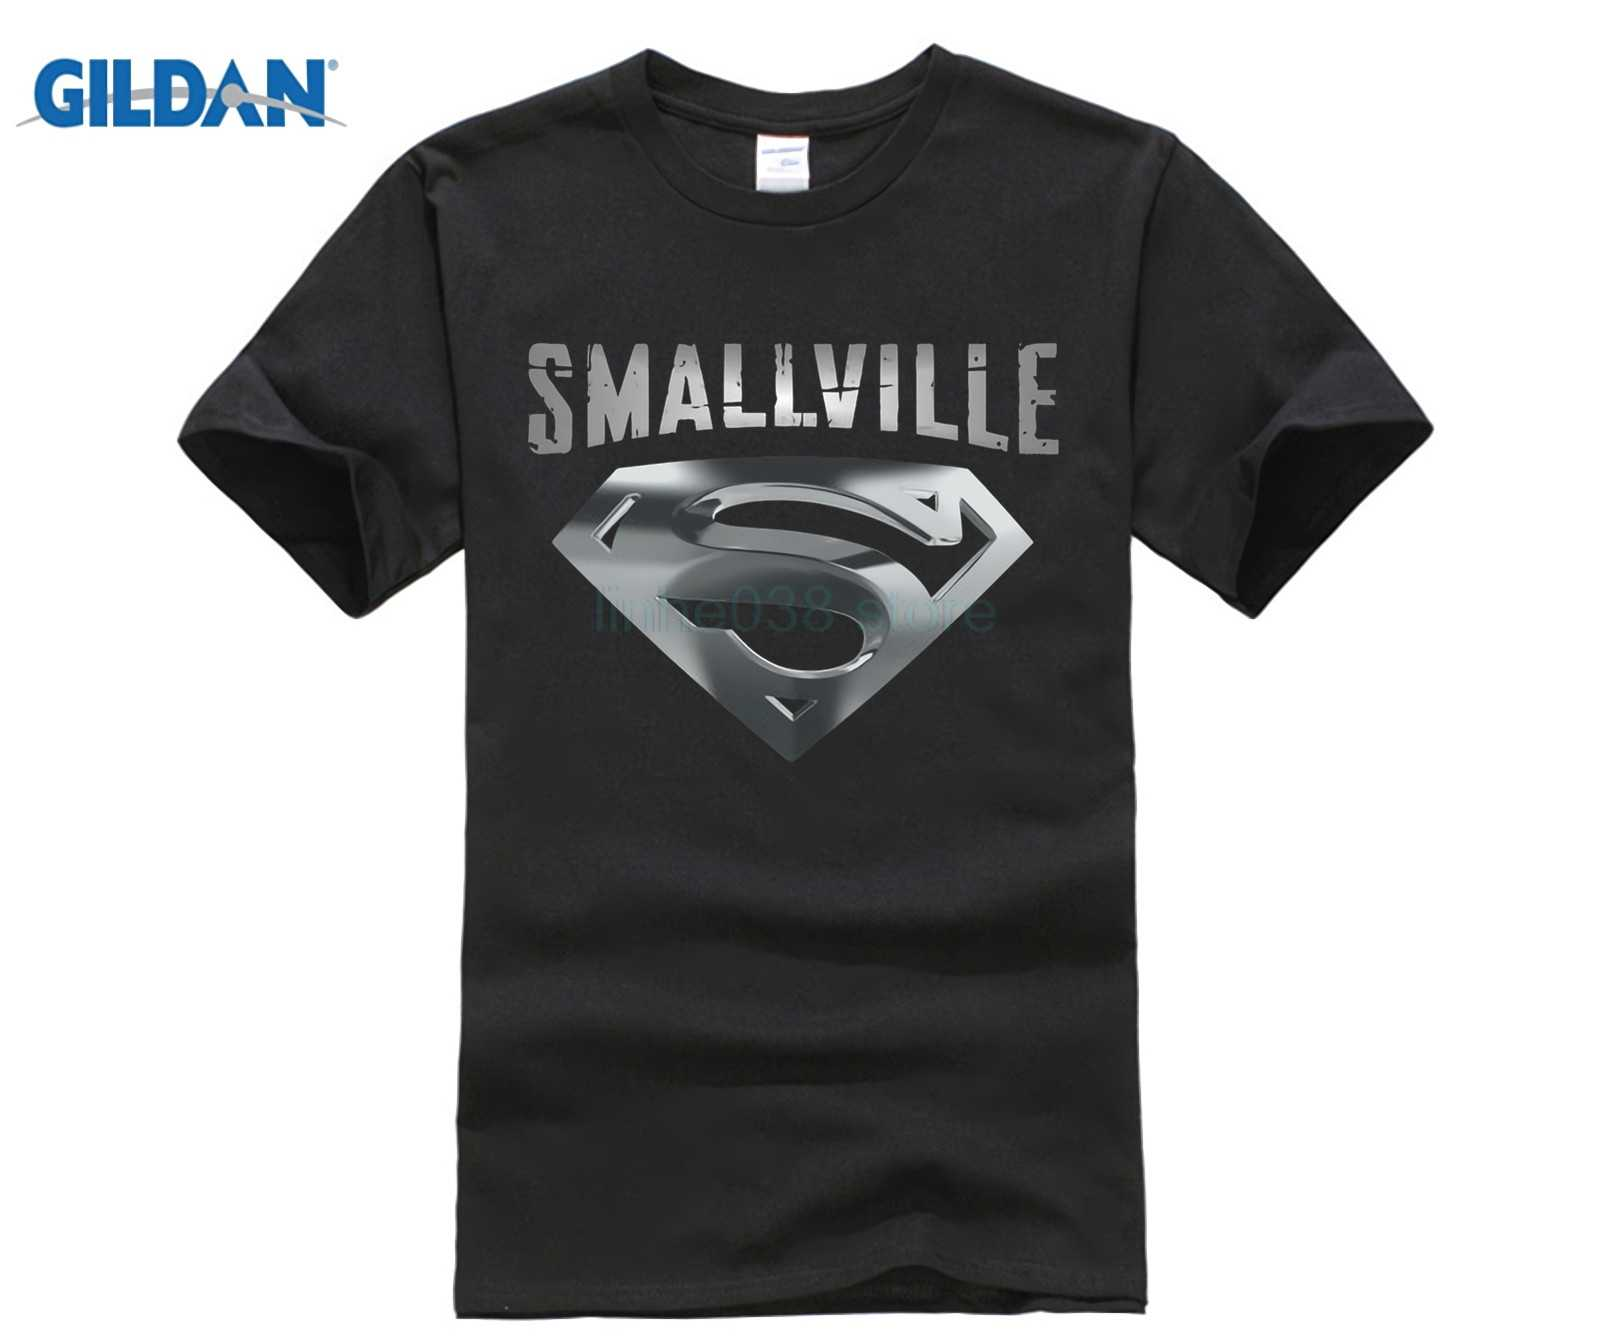 Smallville Superman Silver Logo Black T-shirt USA Size